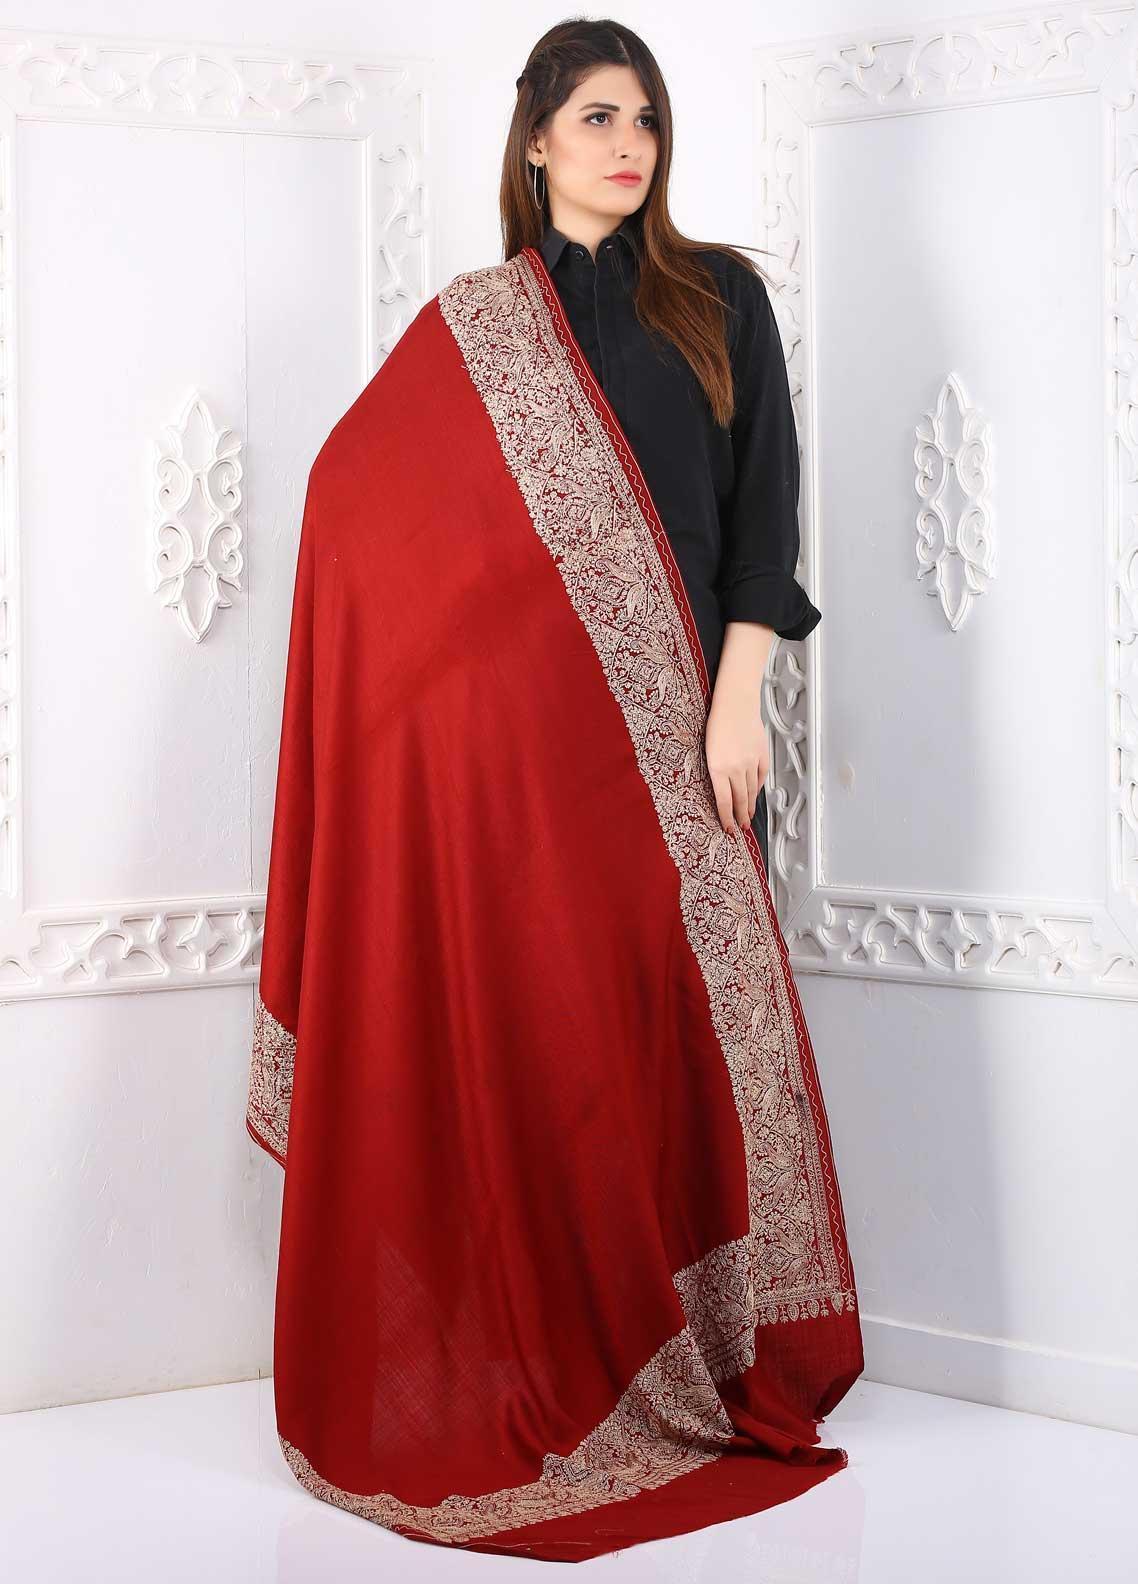 Sanaulla Exclusive Range Embroidered Pashmina  Shawl PMSH 323271 - Pashmina Shawls